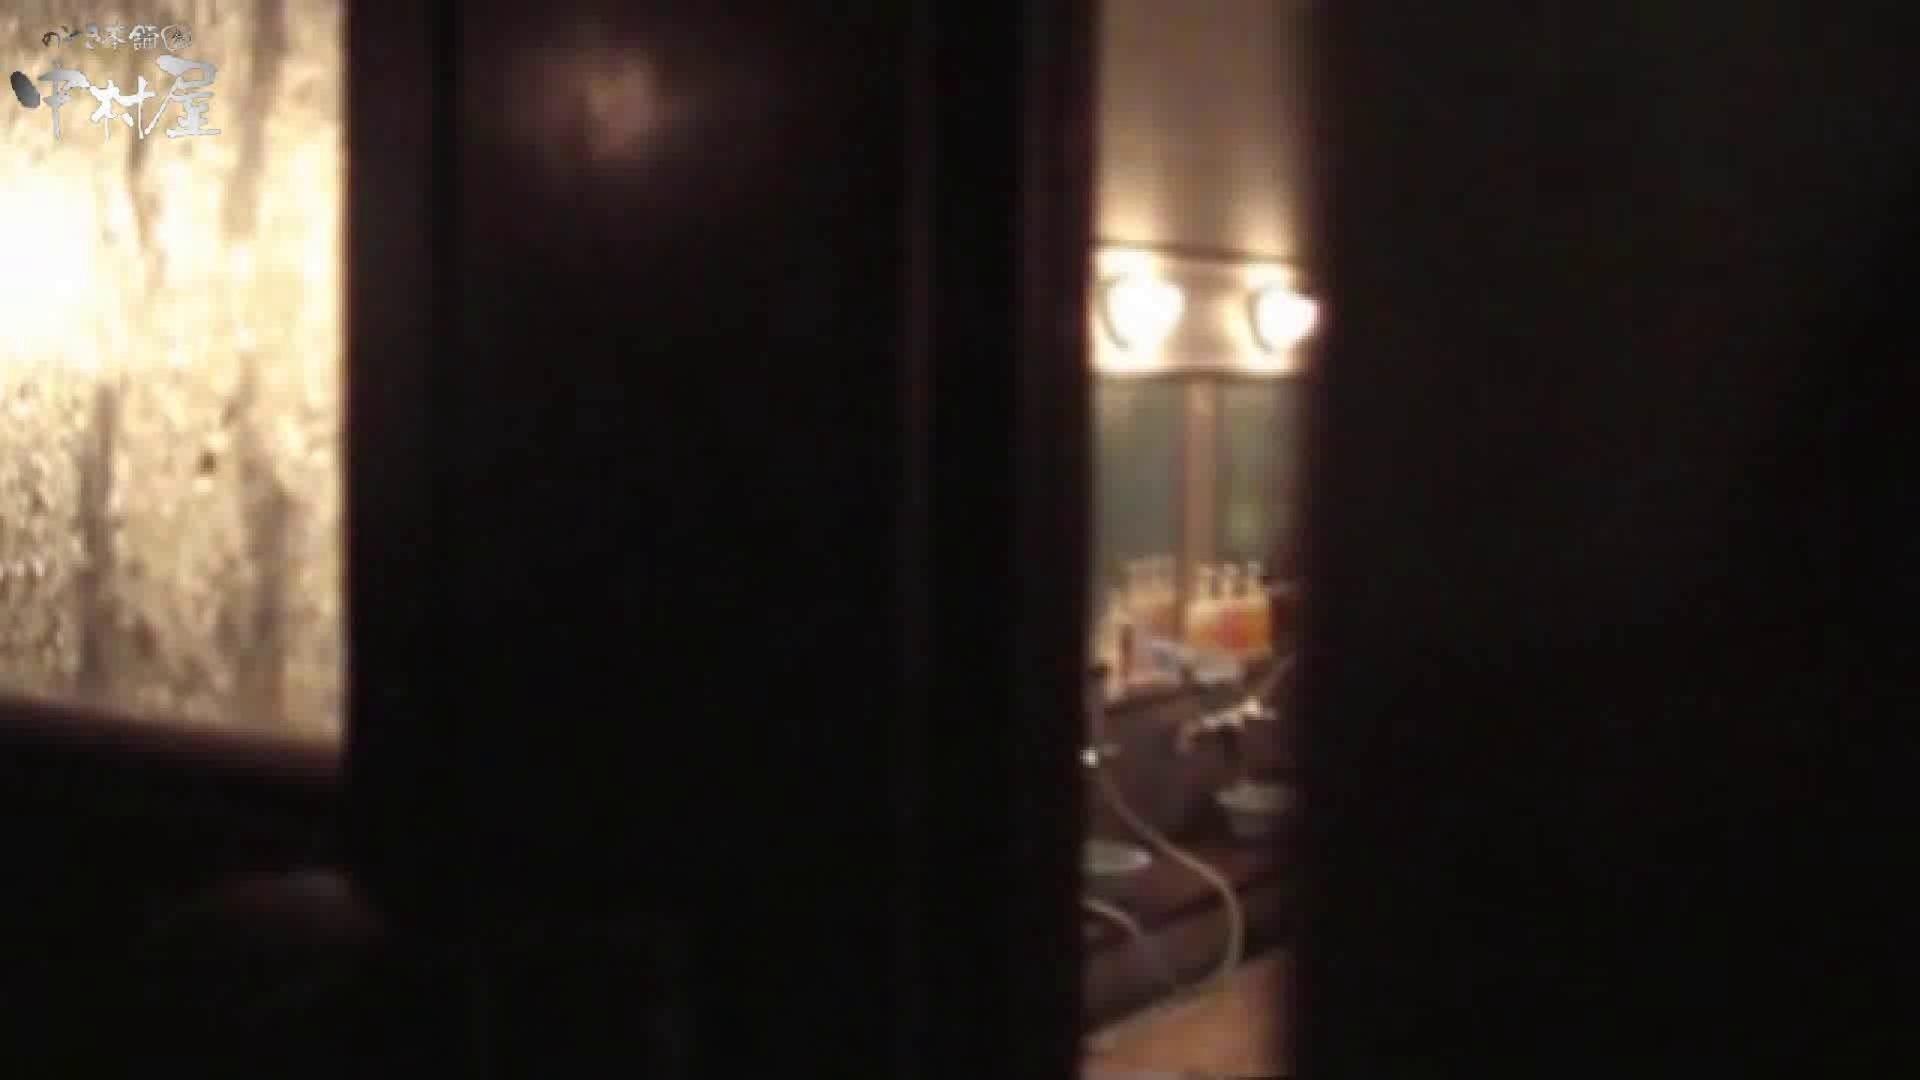 民家風呂専門盗撮師の超危険映像 vol.009 盗撮シリーズ セックス無修正動画無料 90PIX 2